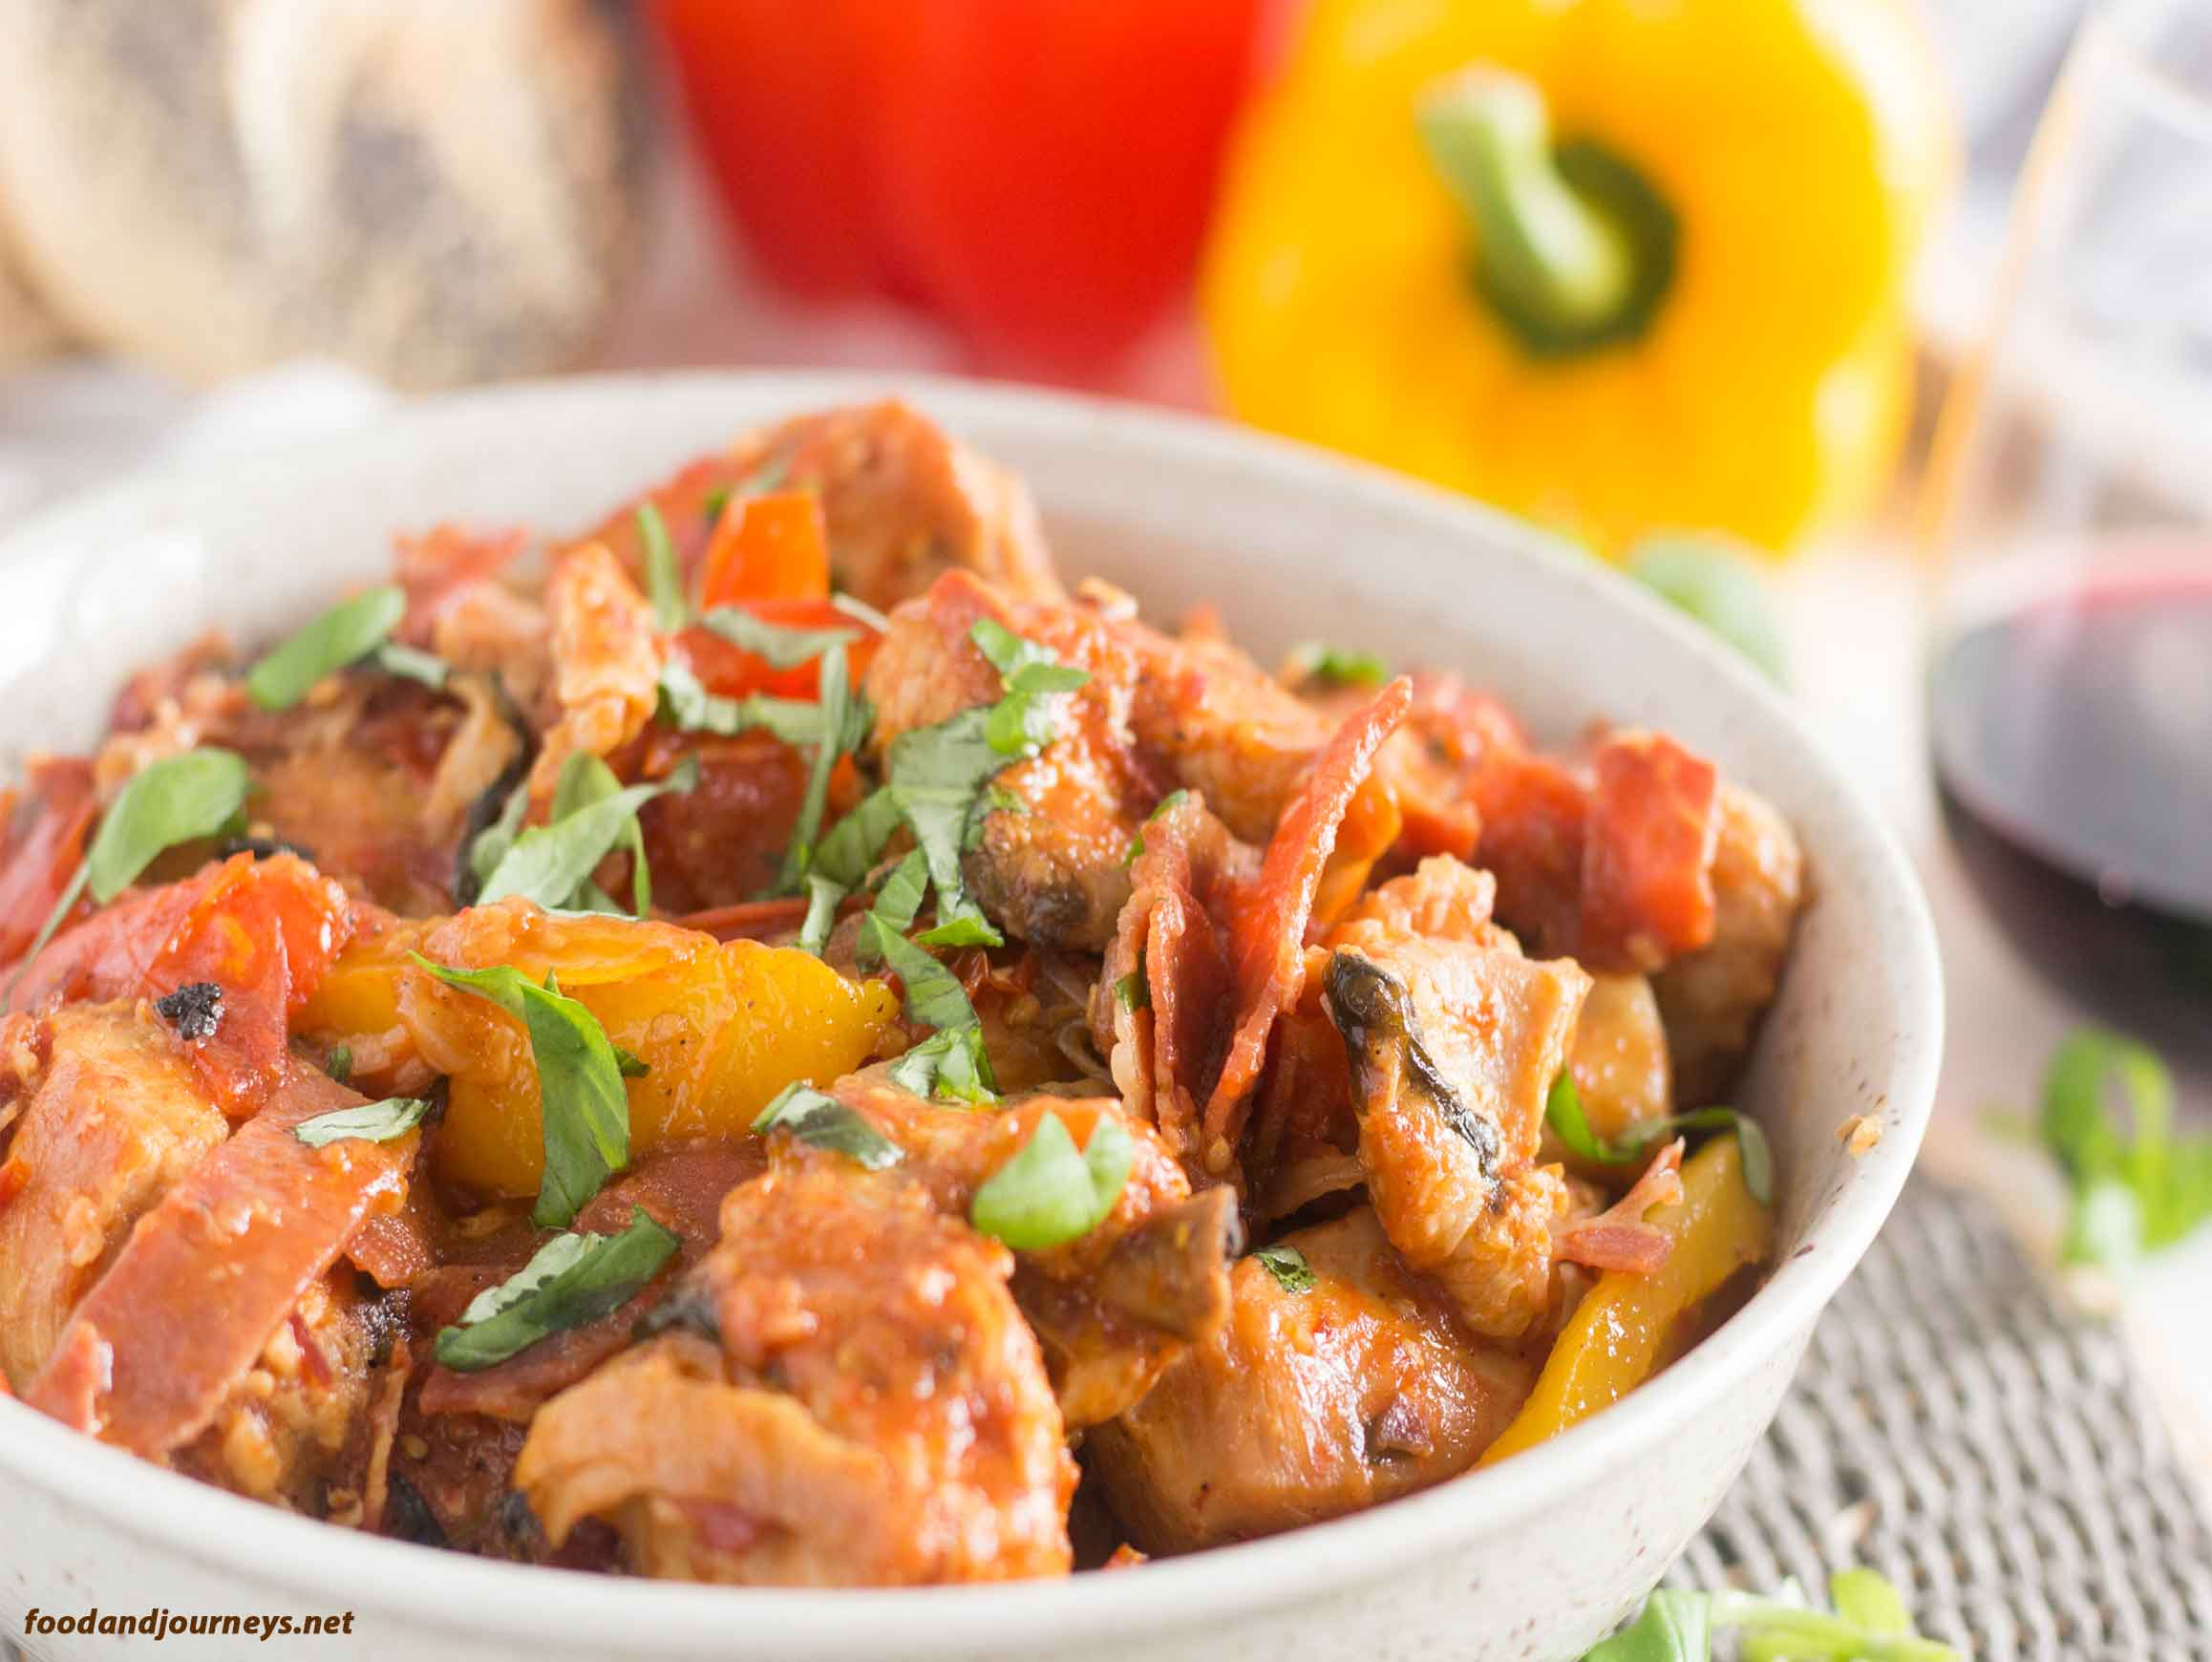 An image of Chicken Romana on a plate|foodandjourneys.net